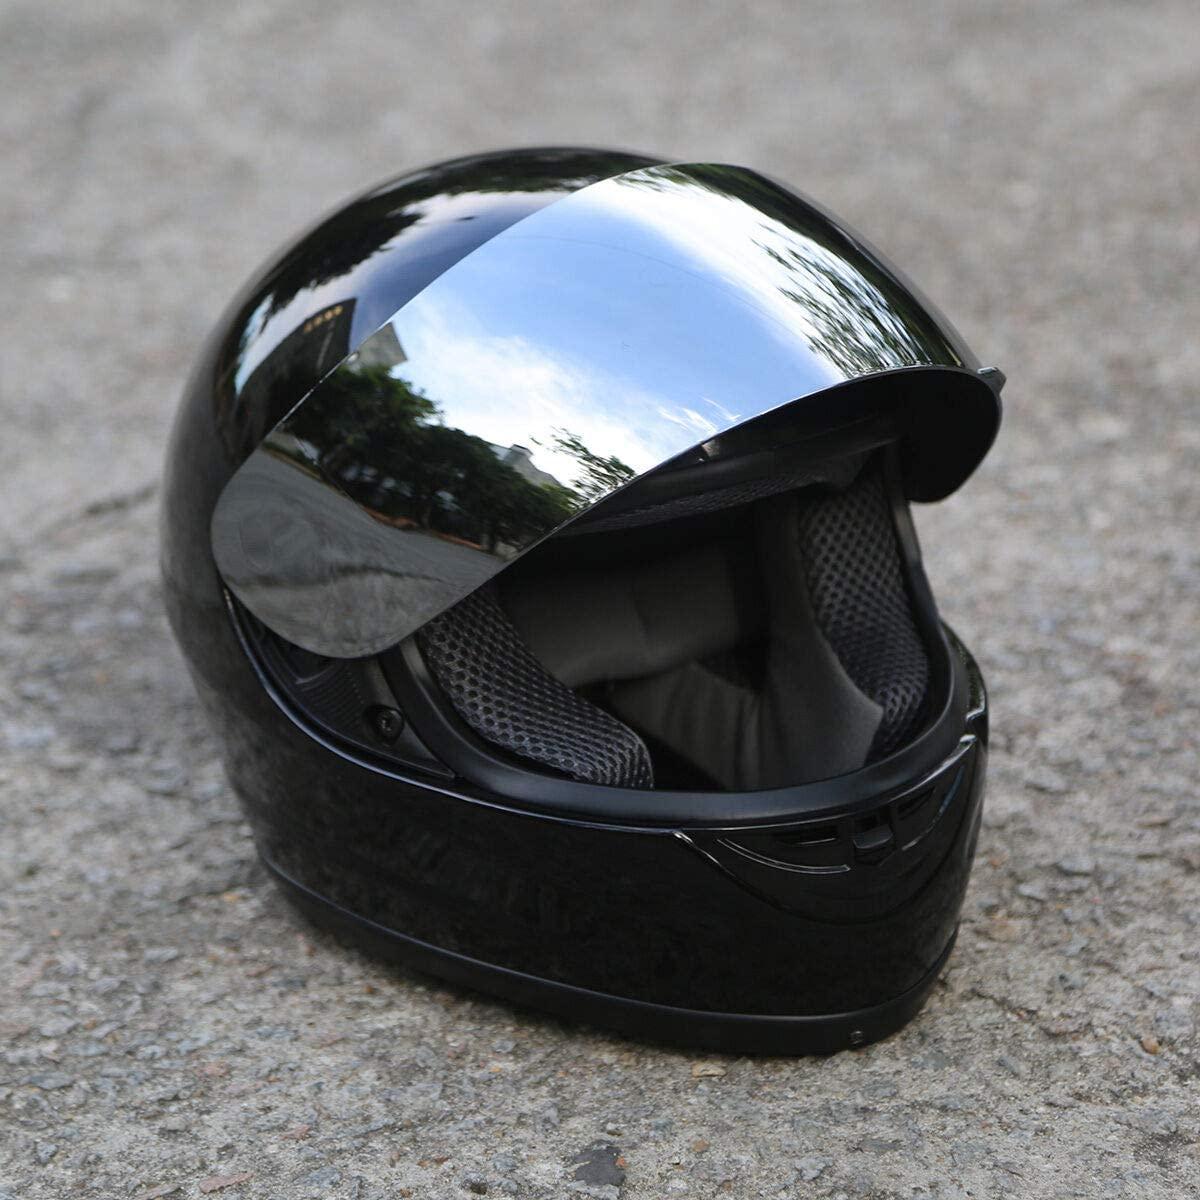 TCT-MT DOT Full Face Helmet Visor Mirror Sun Shield Motorbike Street Sport Motorcycle Adult Helmet Gloss Black (Medium)